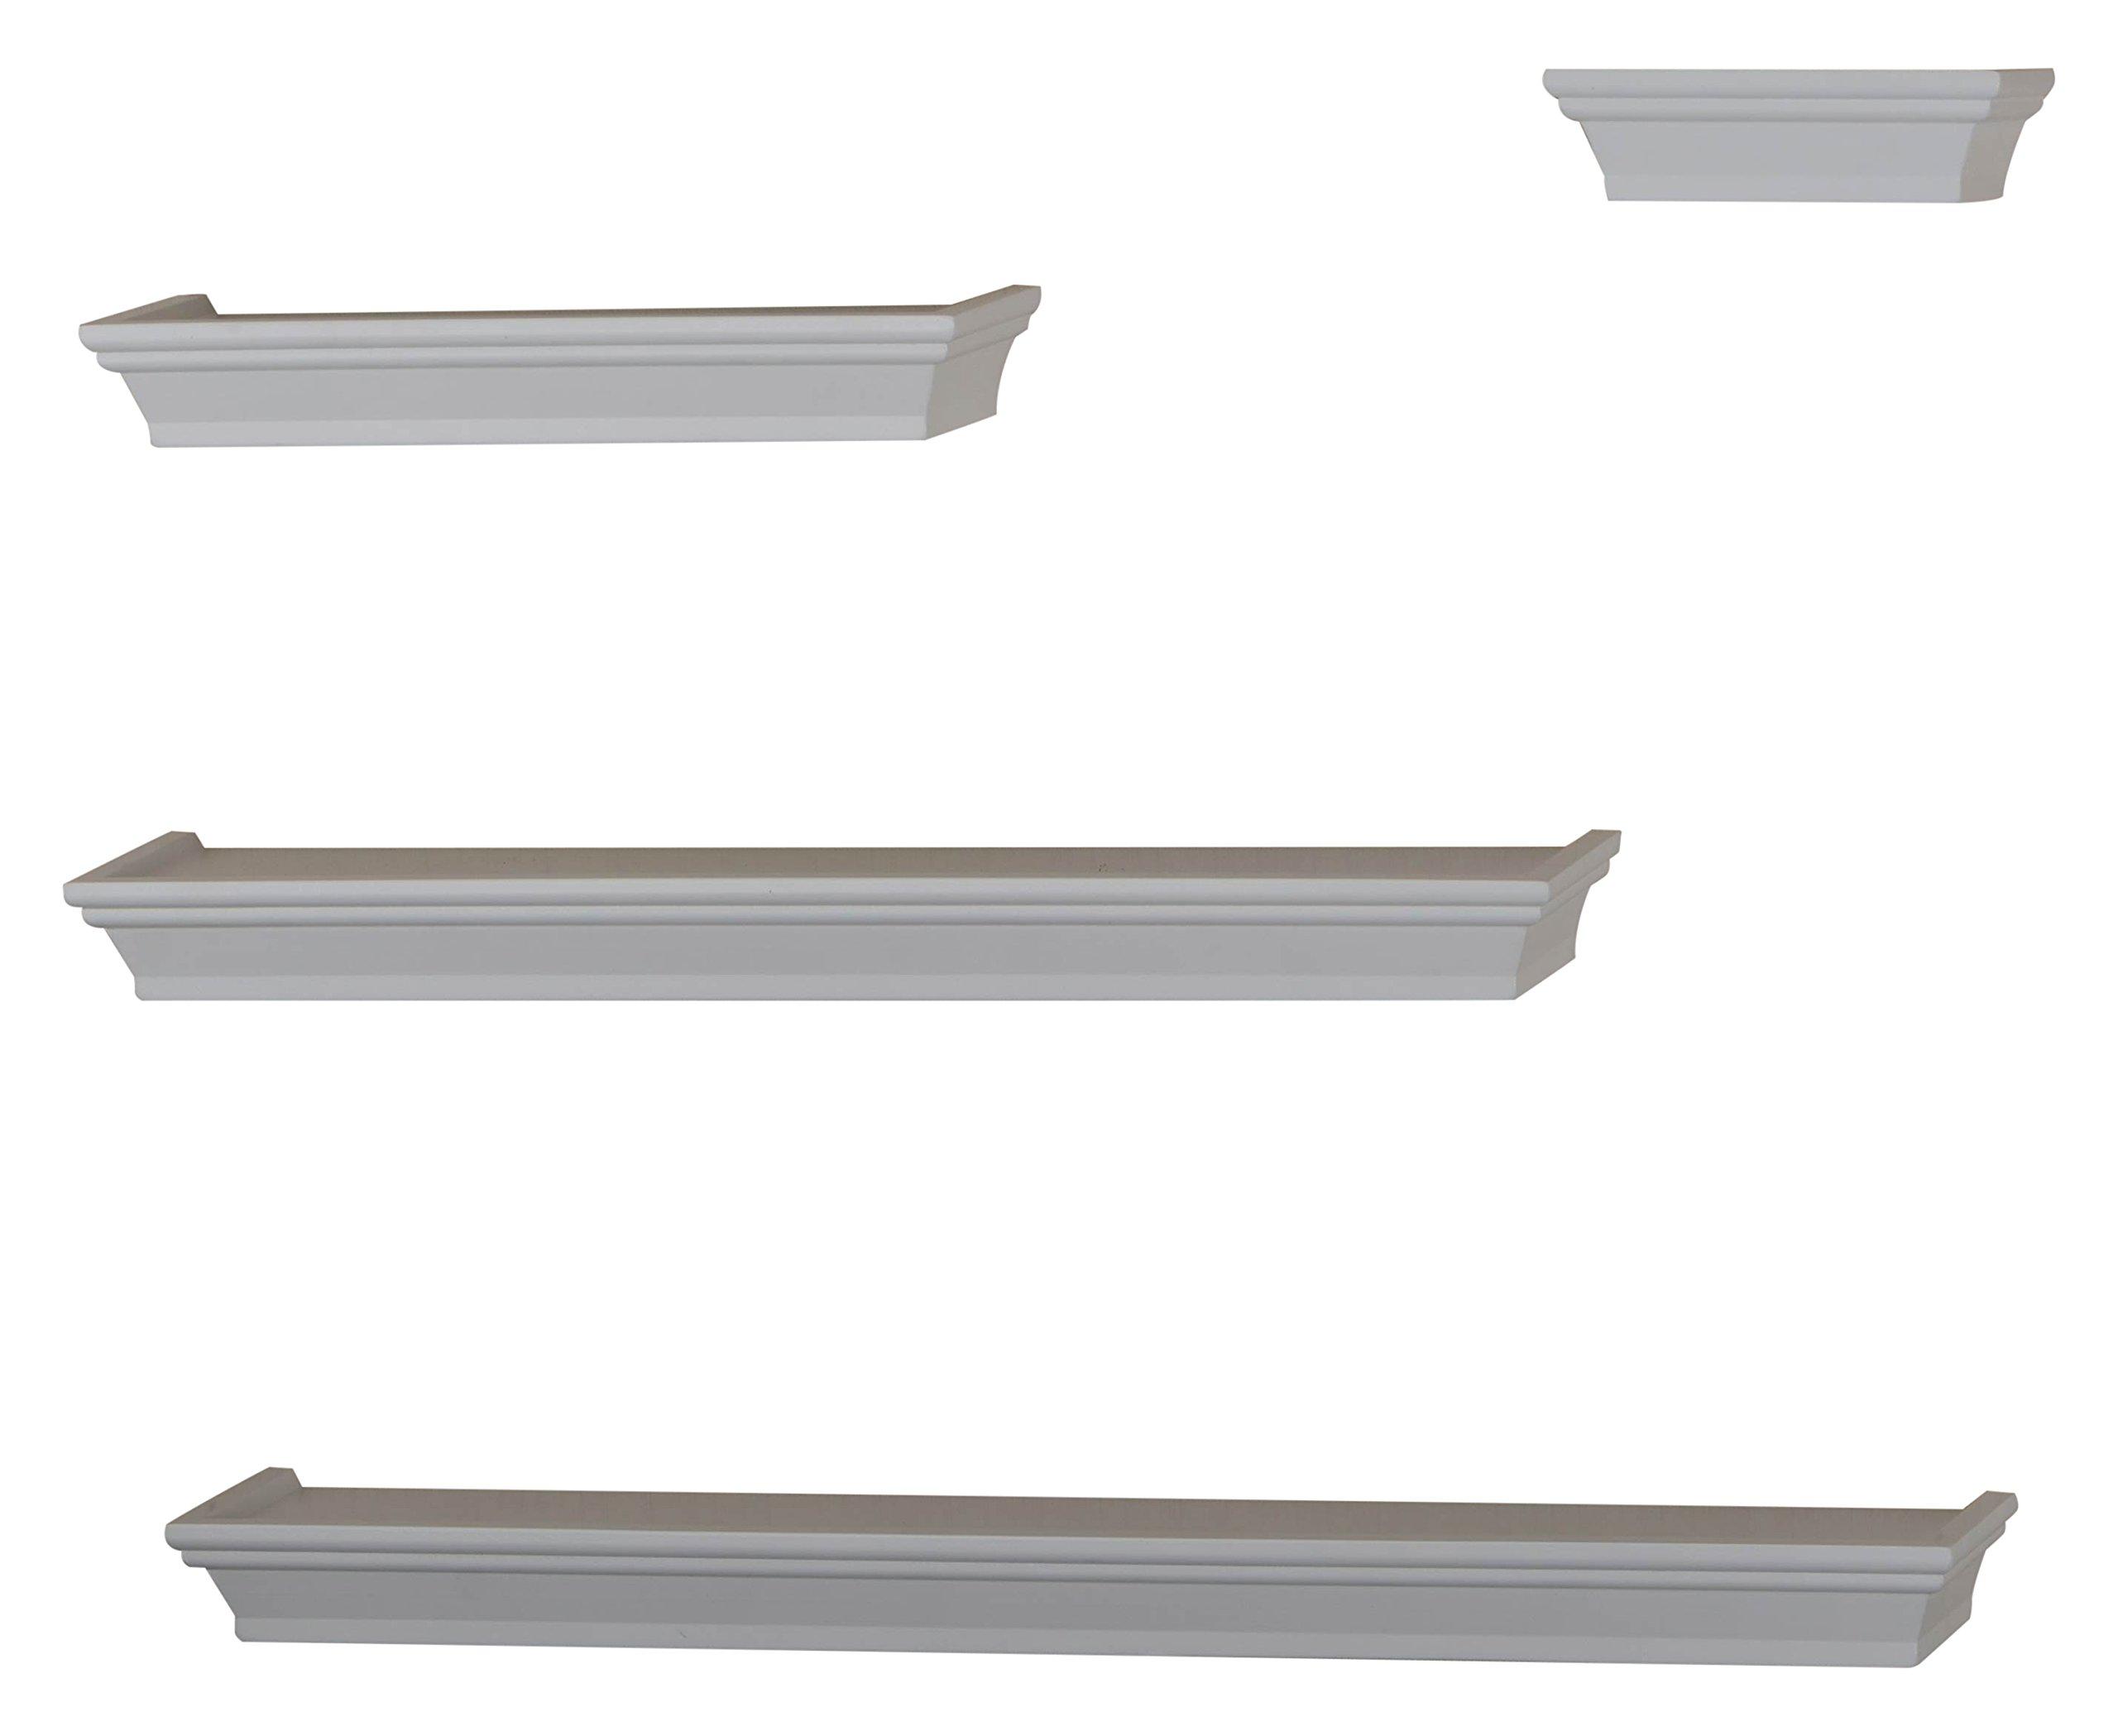 V-Light Set of 4 Traditional Wood Wall, White Finish, (VS141003W) Decorative Shelving